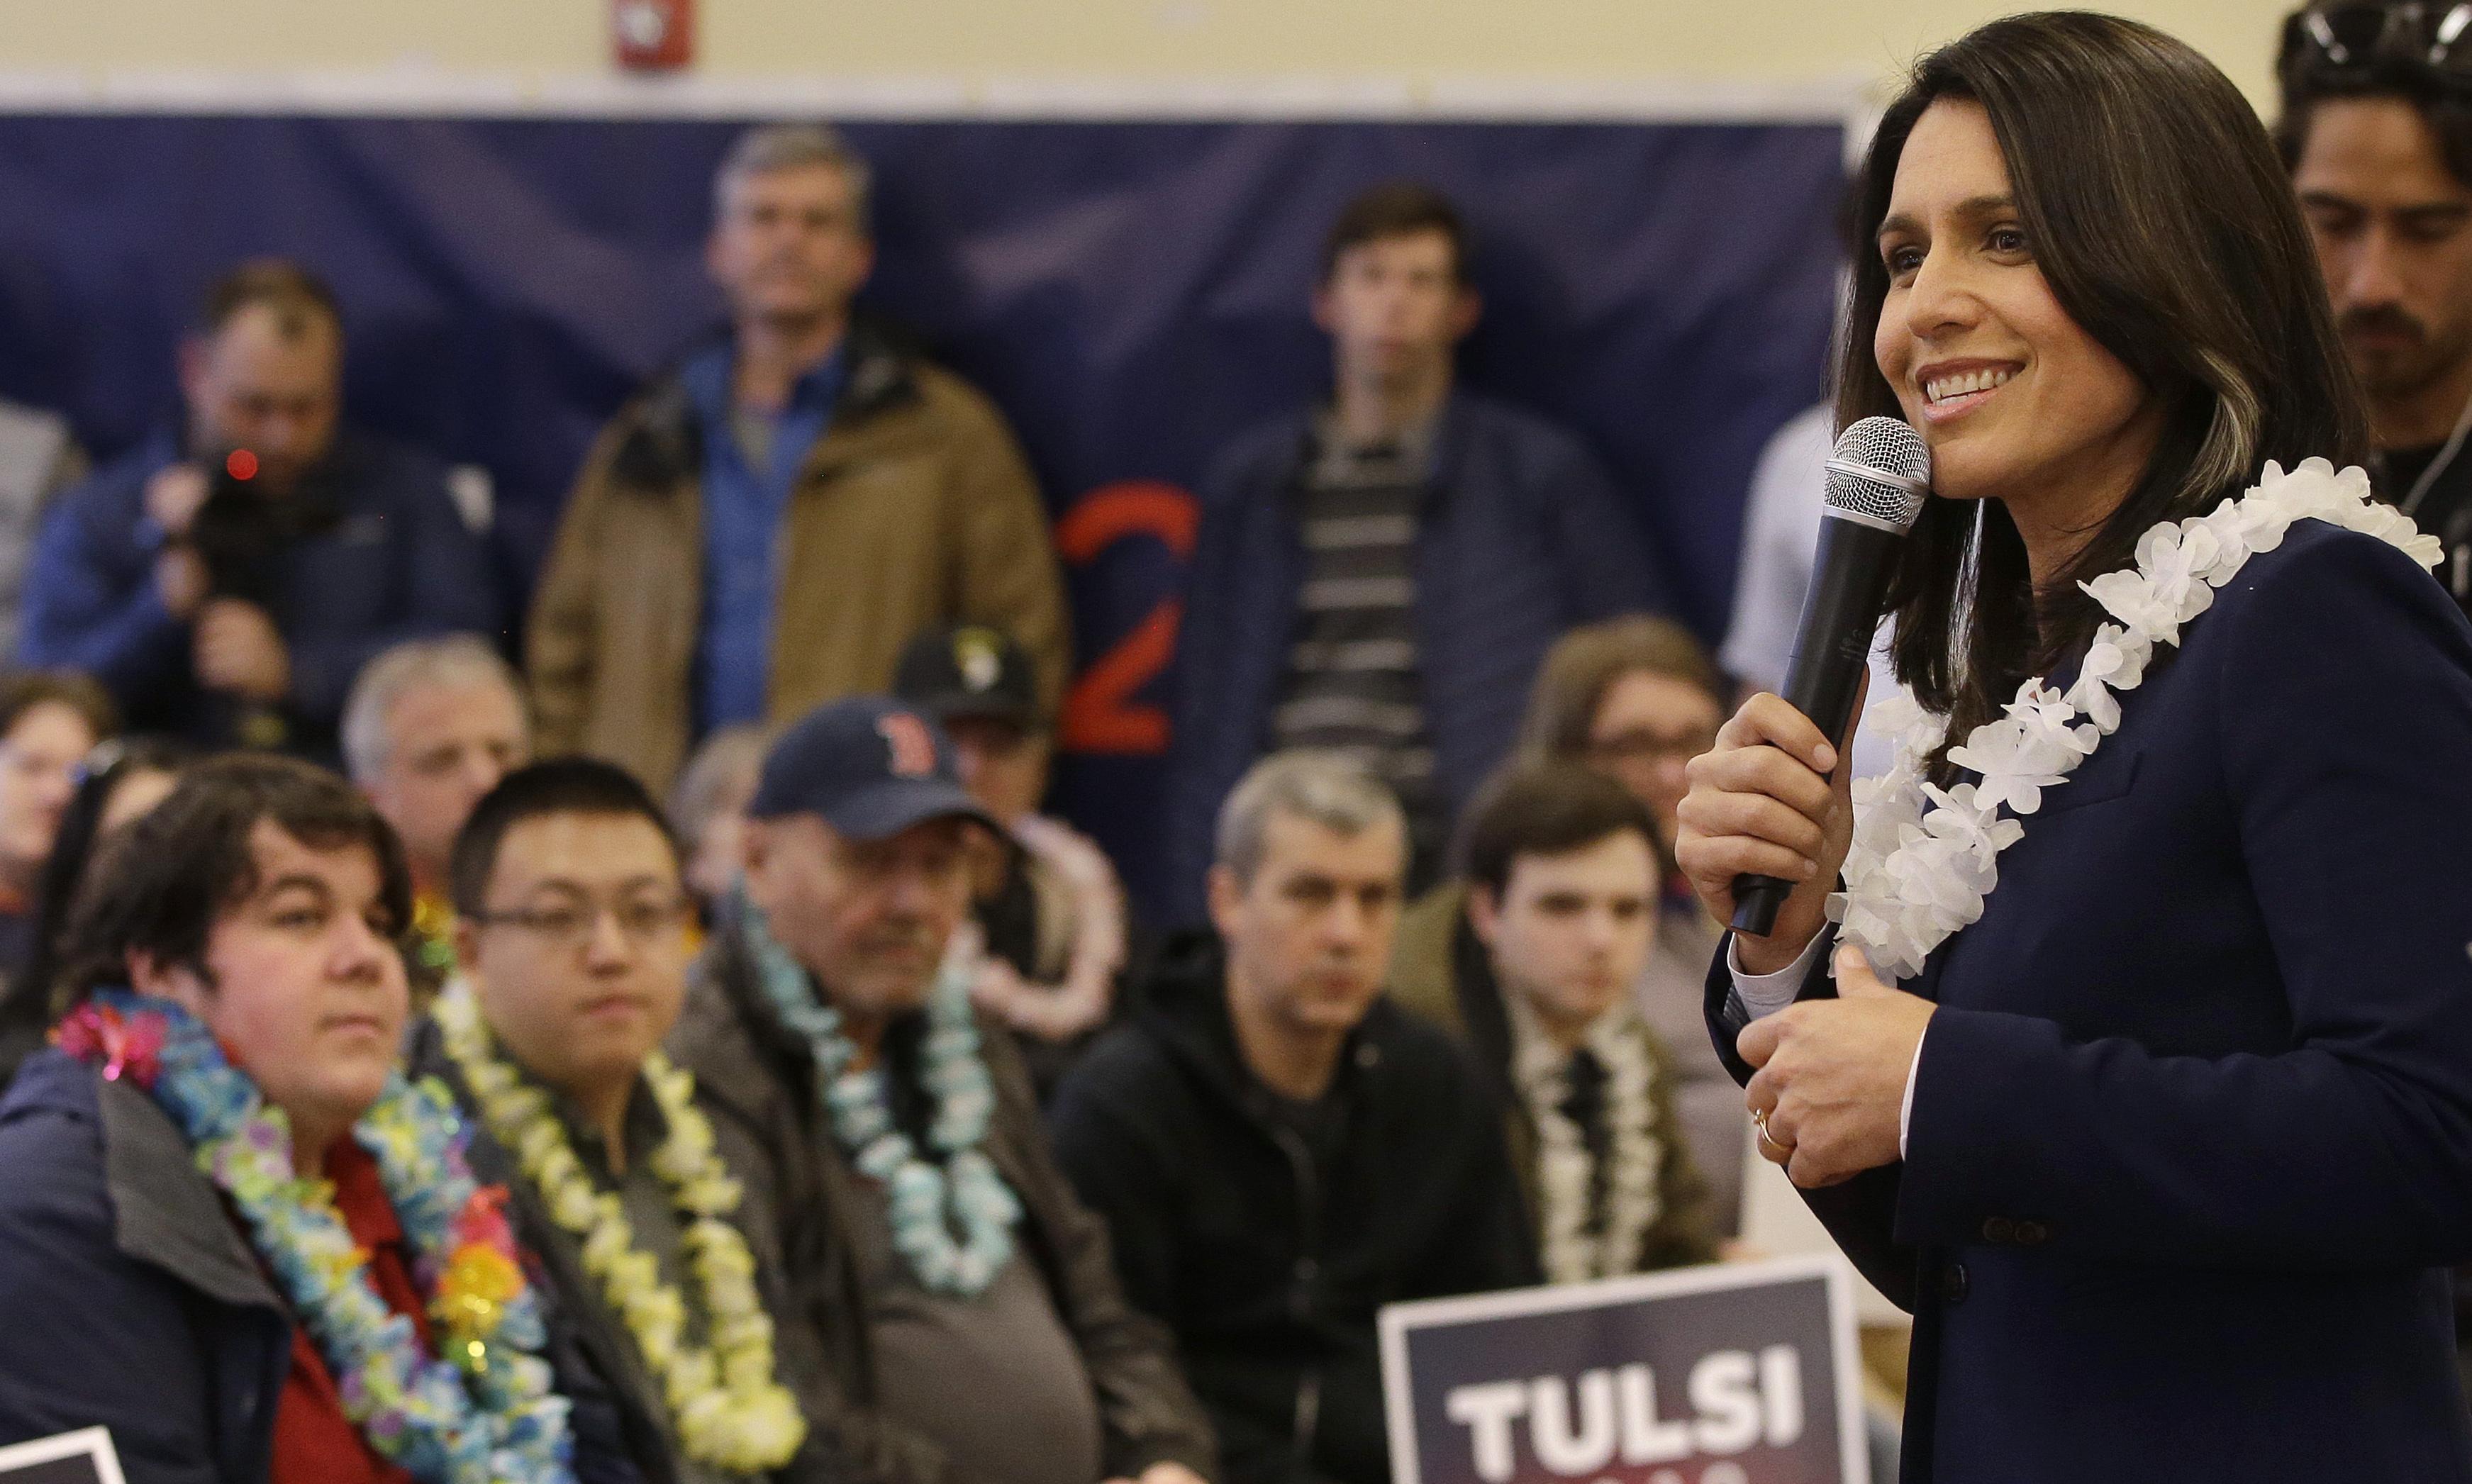 Tulsi Gabbard: is the Iraq war veteran 2020's most divisive candidate?